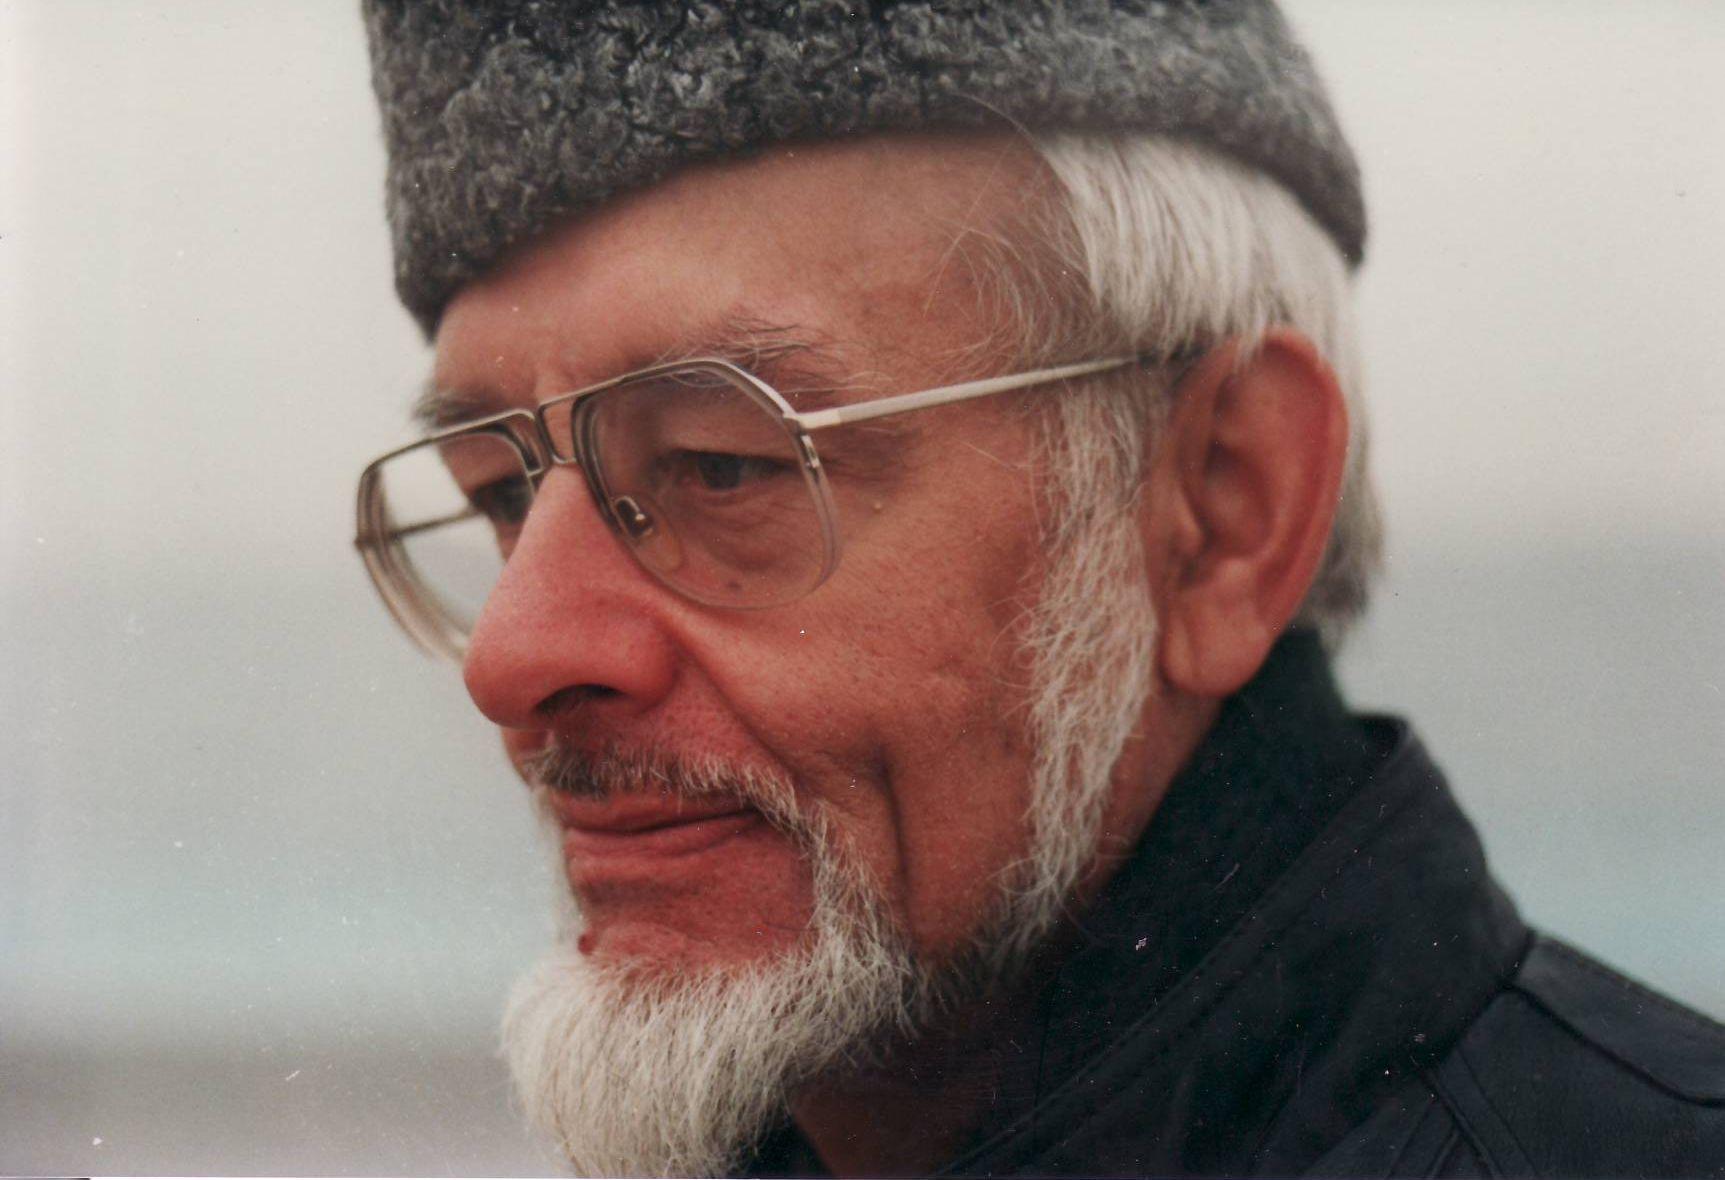 Paul Krämer